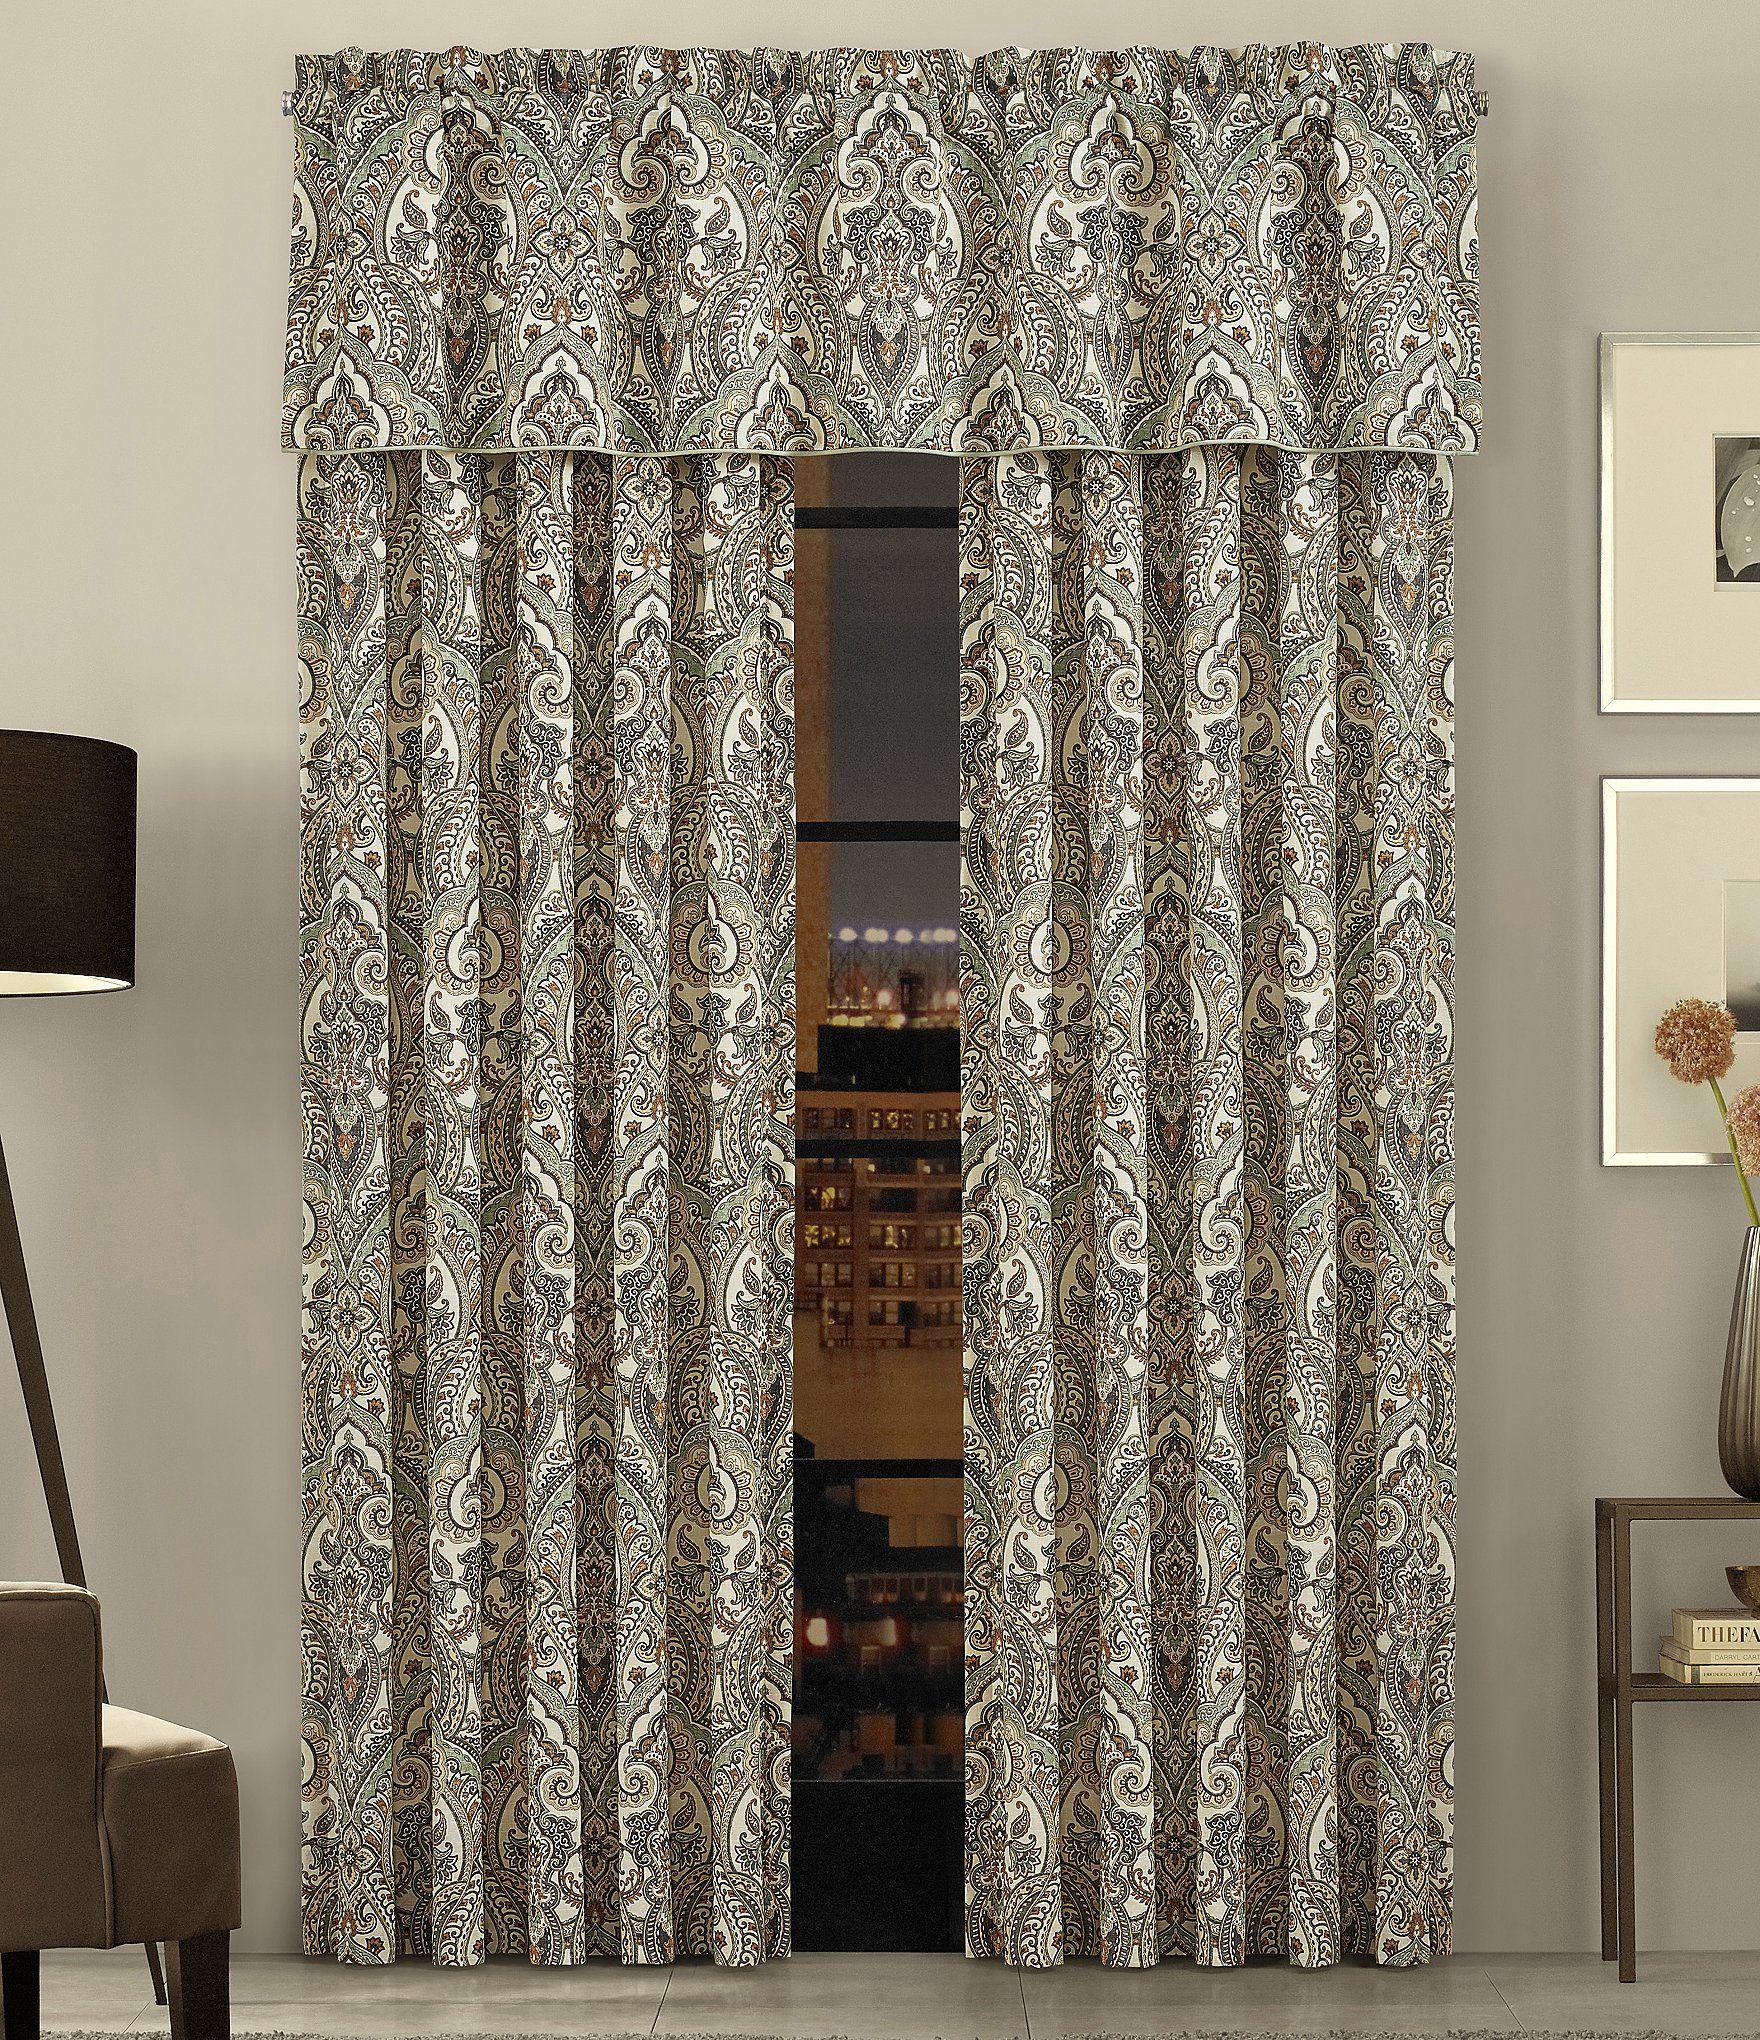 Vienna Window Treatments Queens New York Drapery Panels Panel Curtains